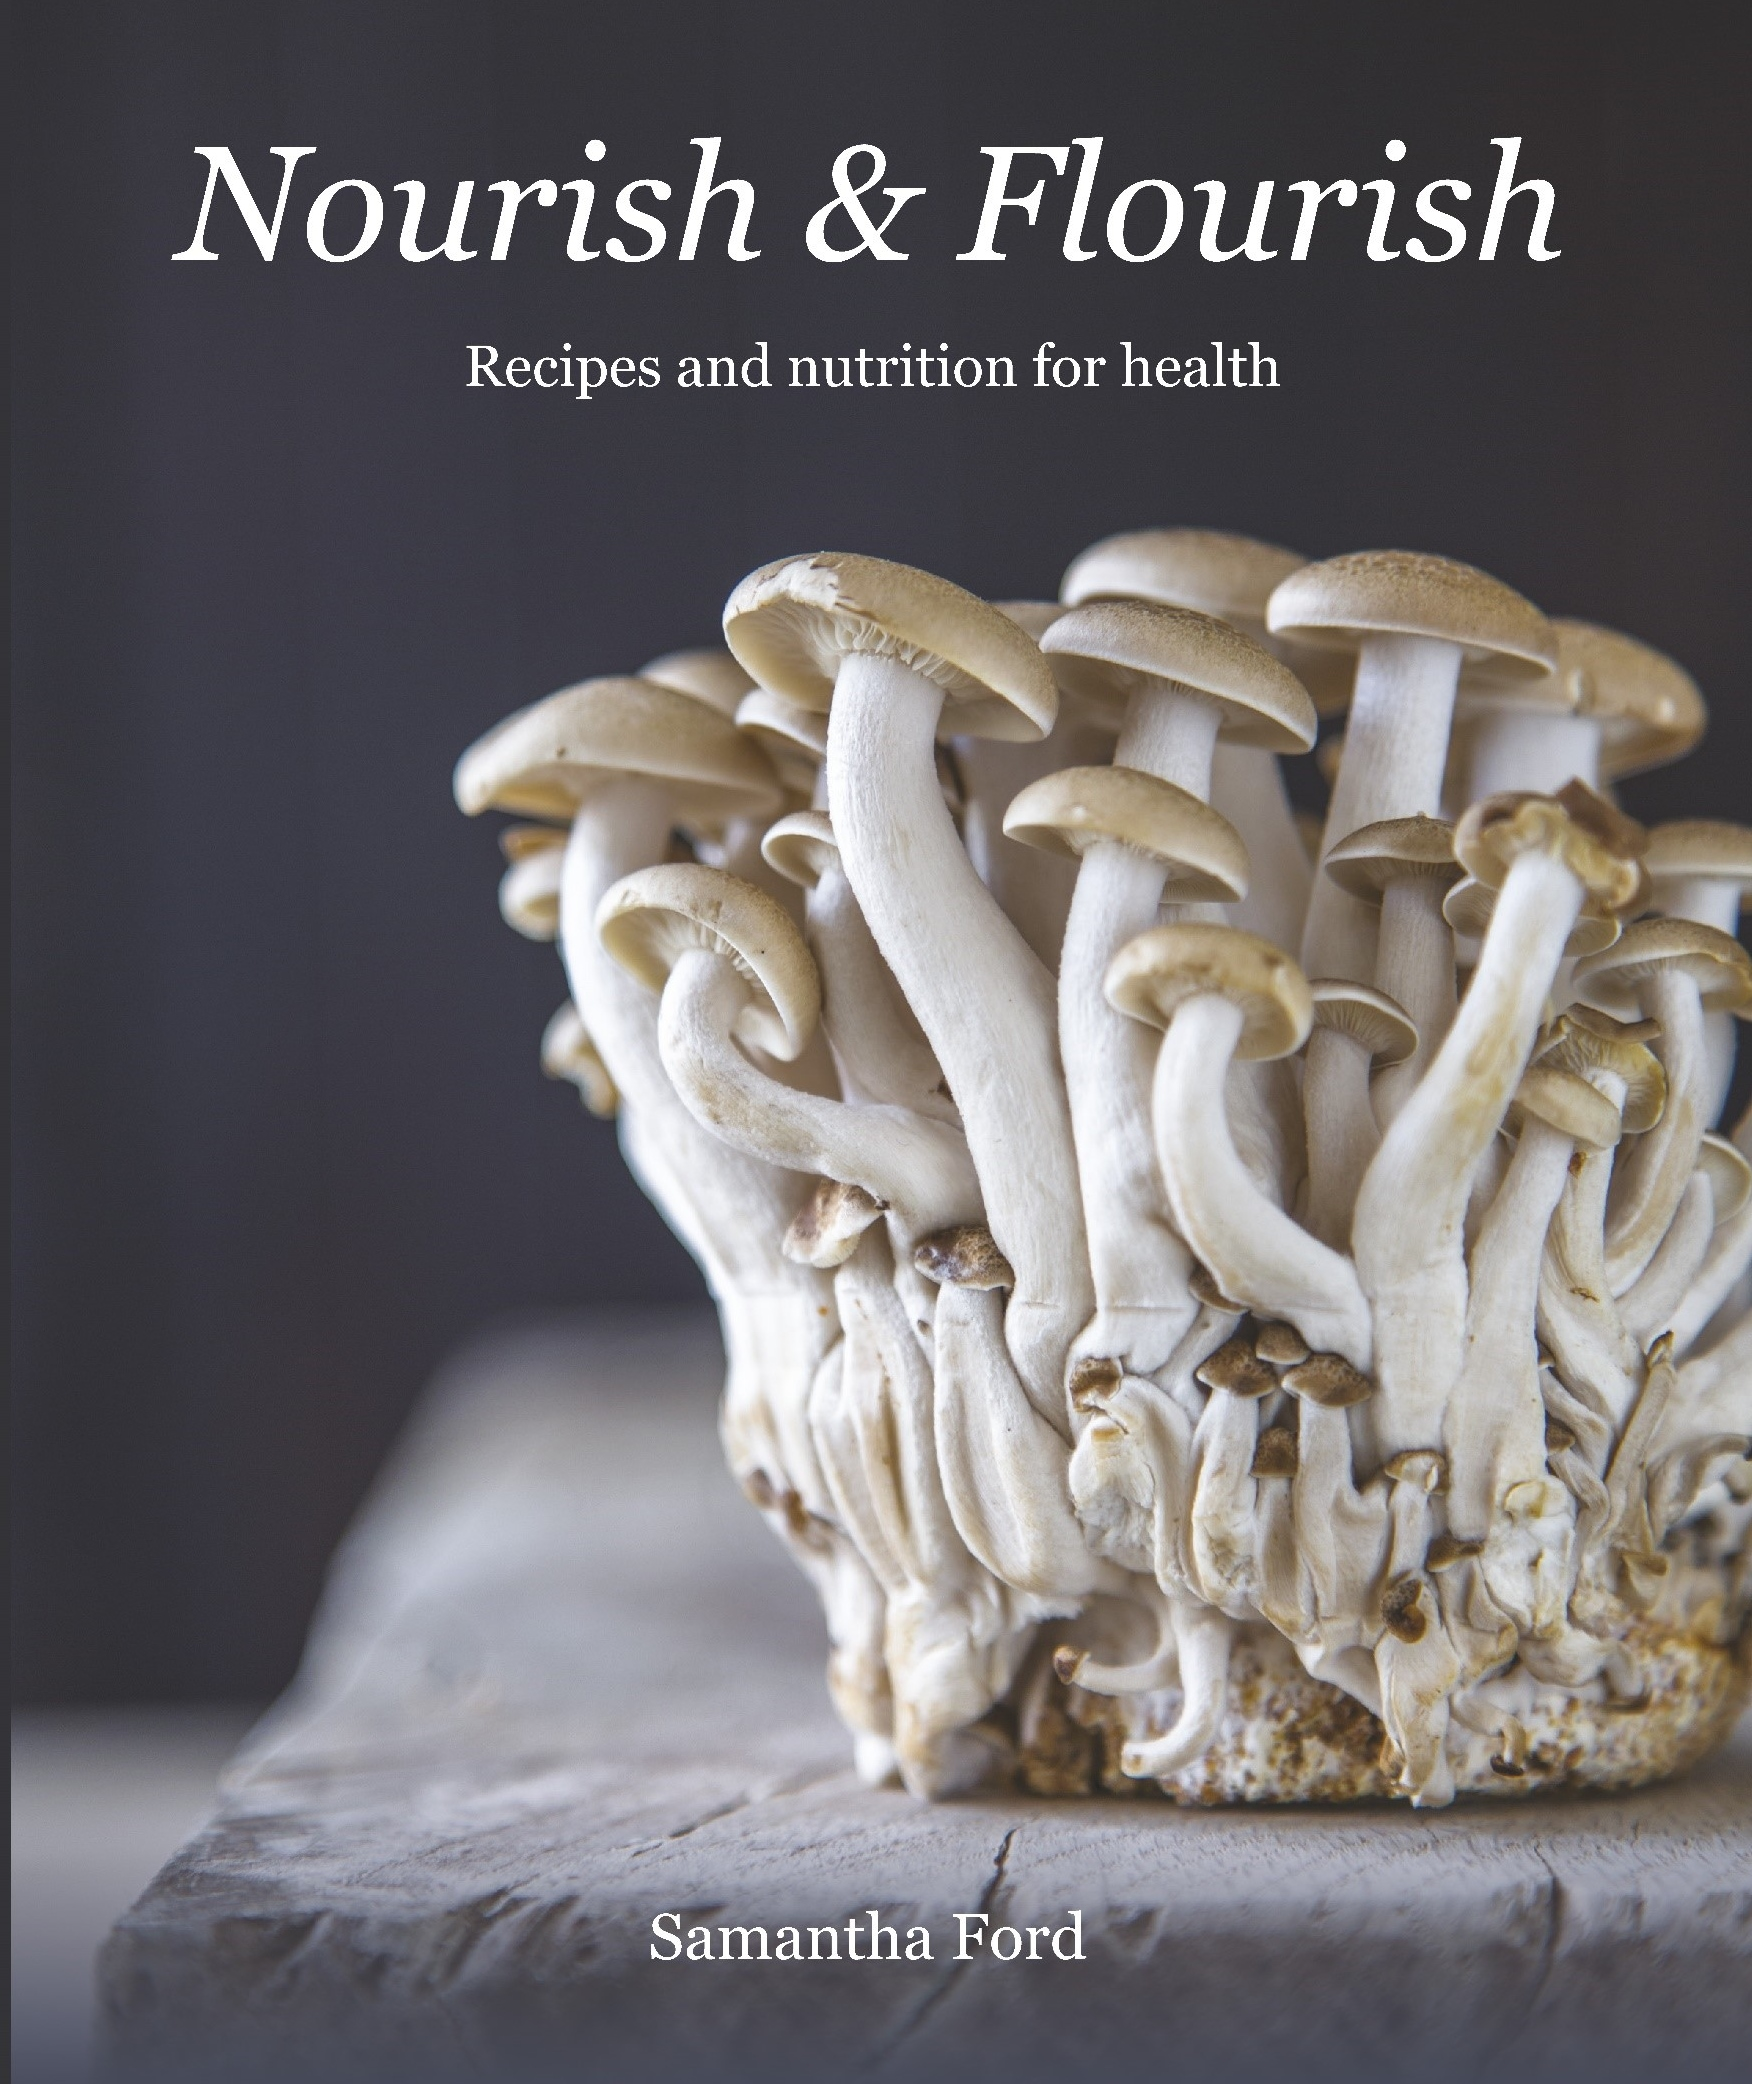 Nourish & Flourish (Paperback)